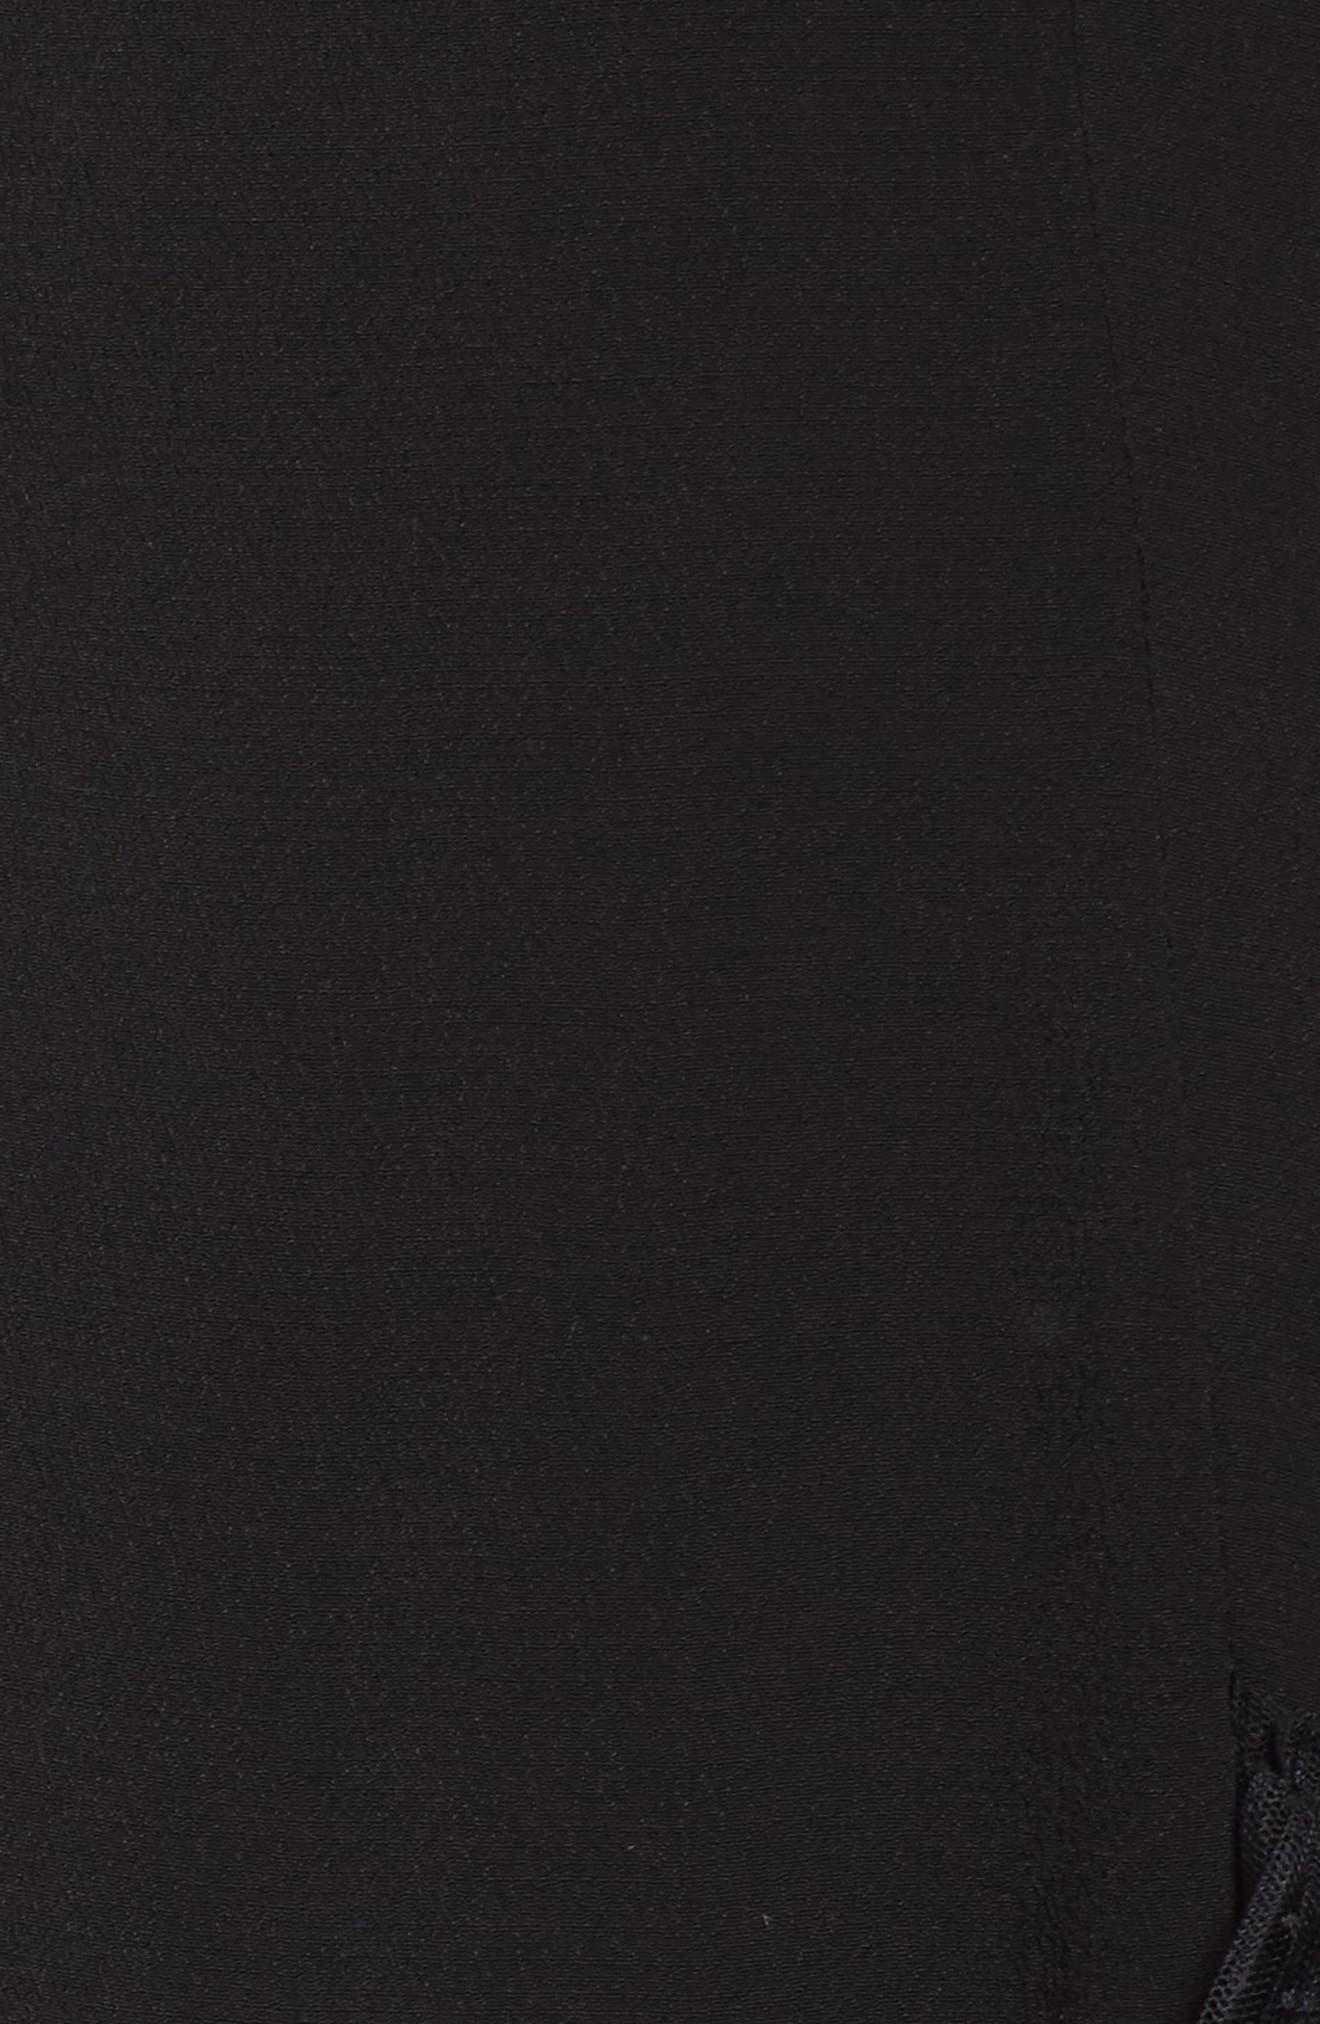 Evie Minidress,                             Alternate thumbnail 5, color,                             Black